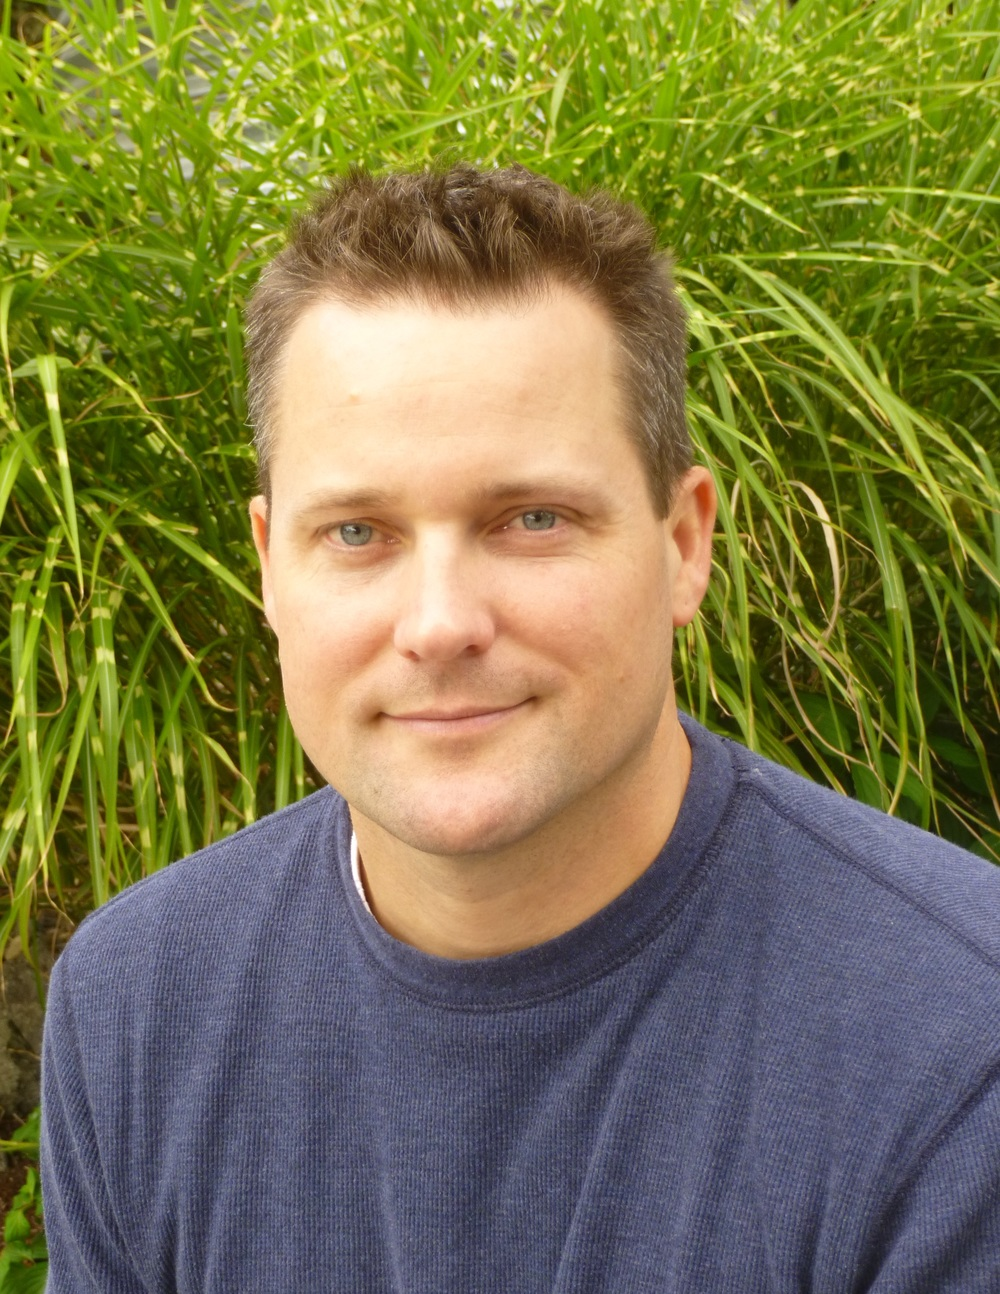 Mark Swank